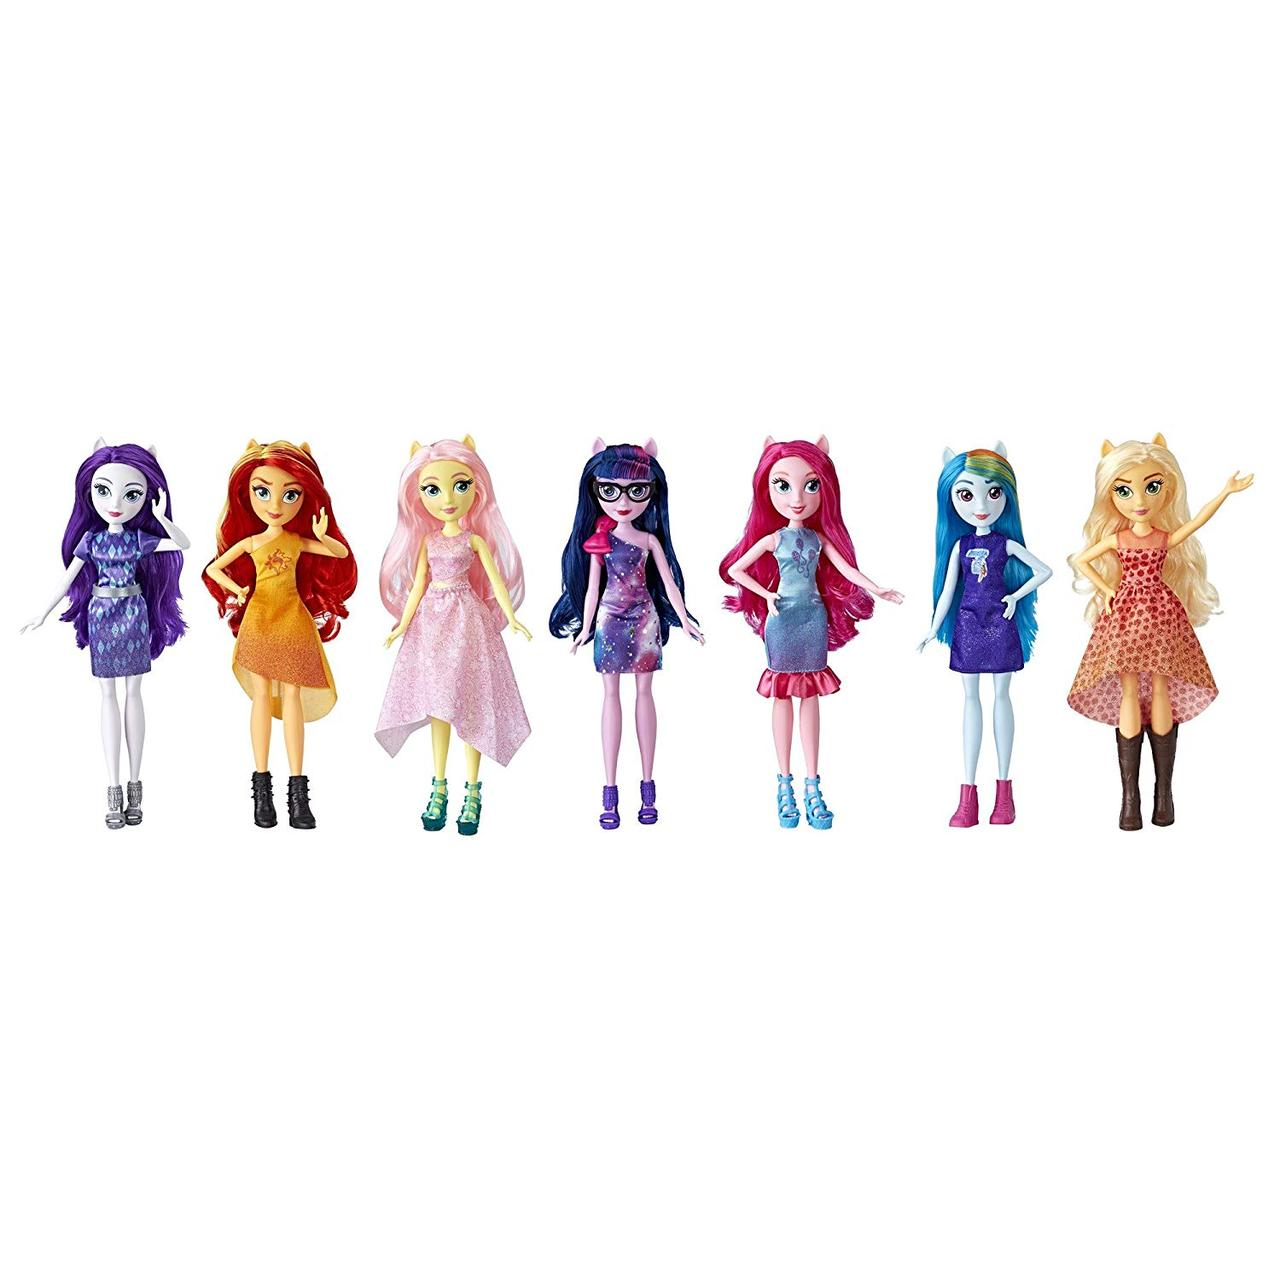 My Little Pony Equestria Girls девочки эквестрии набор из 7-ми кукол вечеринка Friendship Party Pack